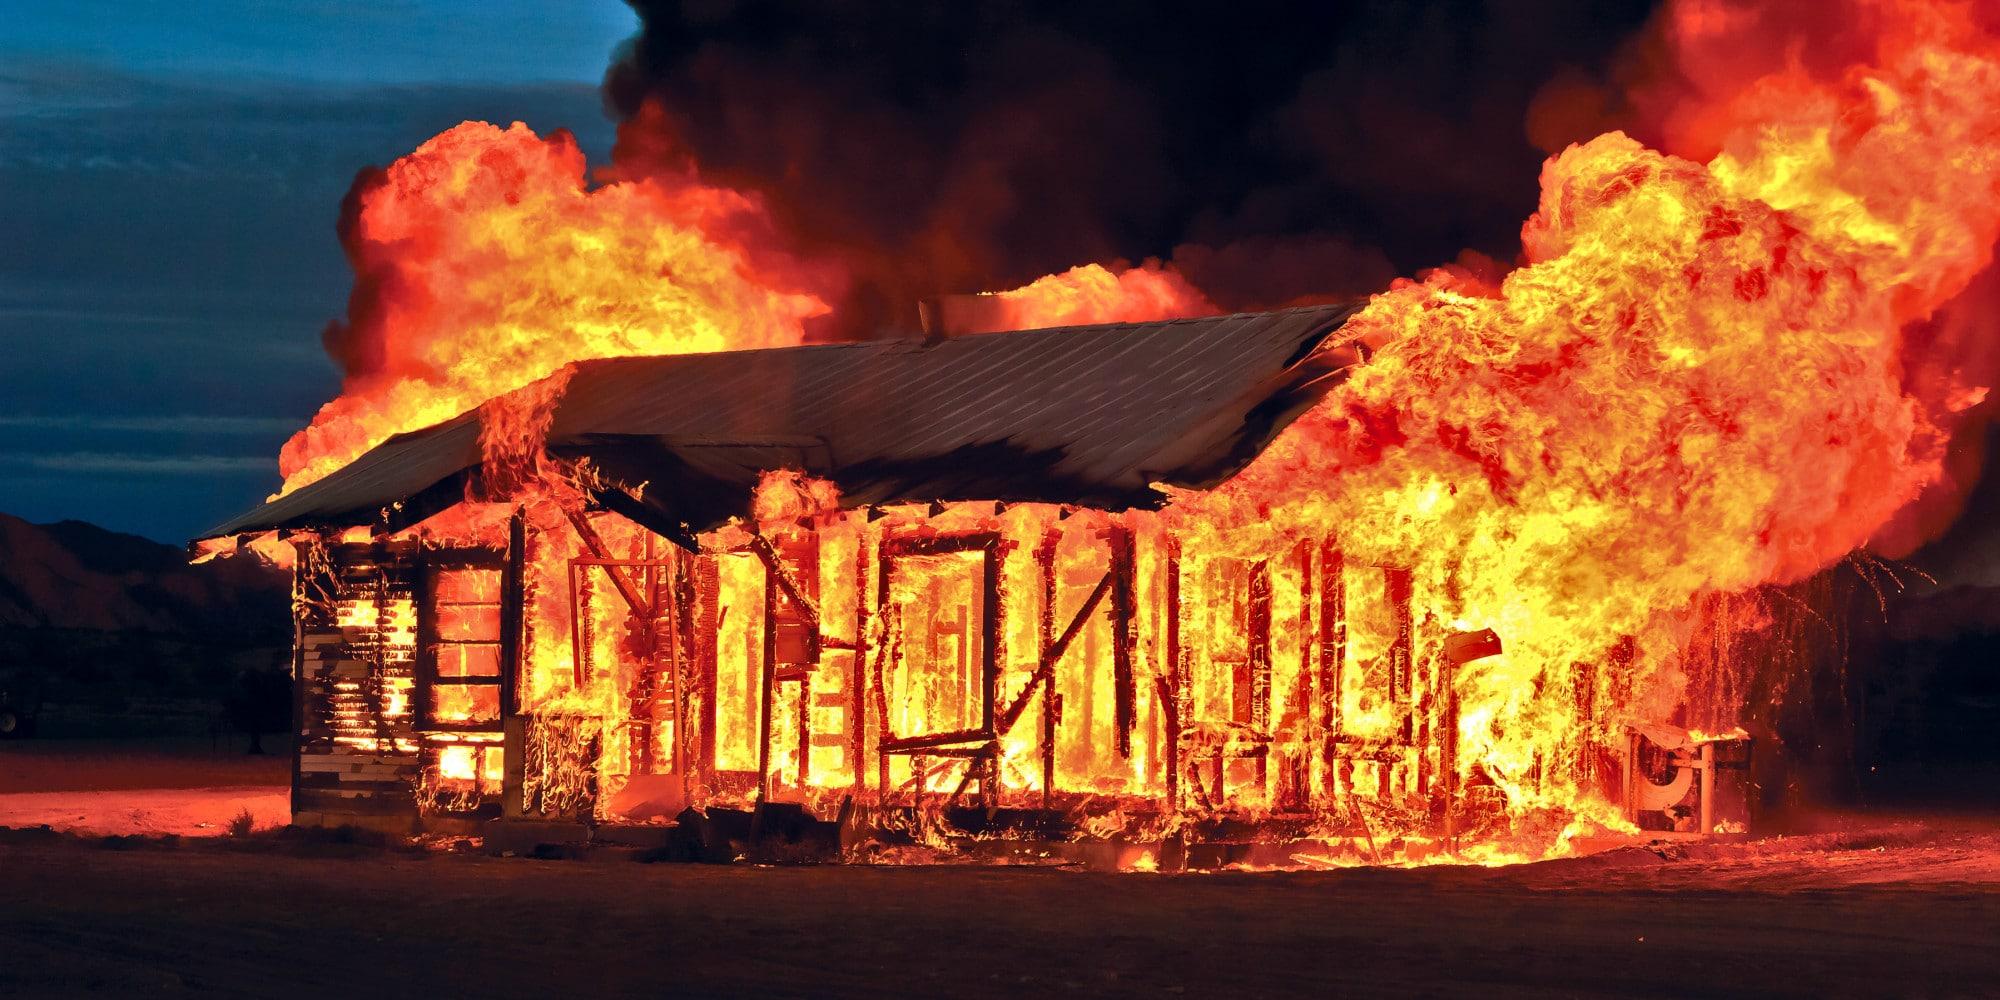 USA, Arizona, Maricopa County, Gila Bend, Burning Down House